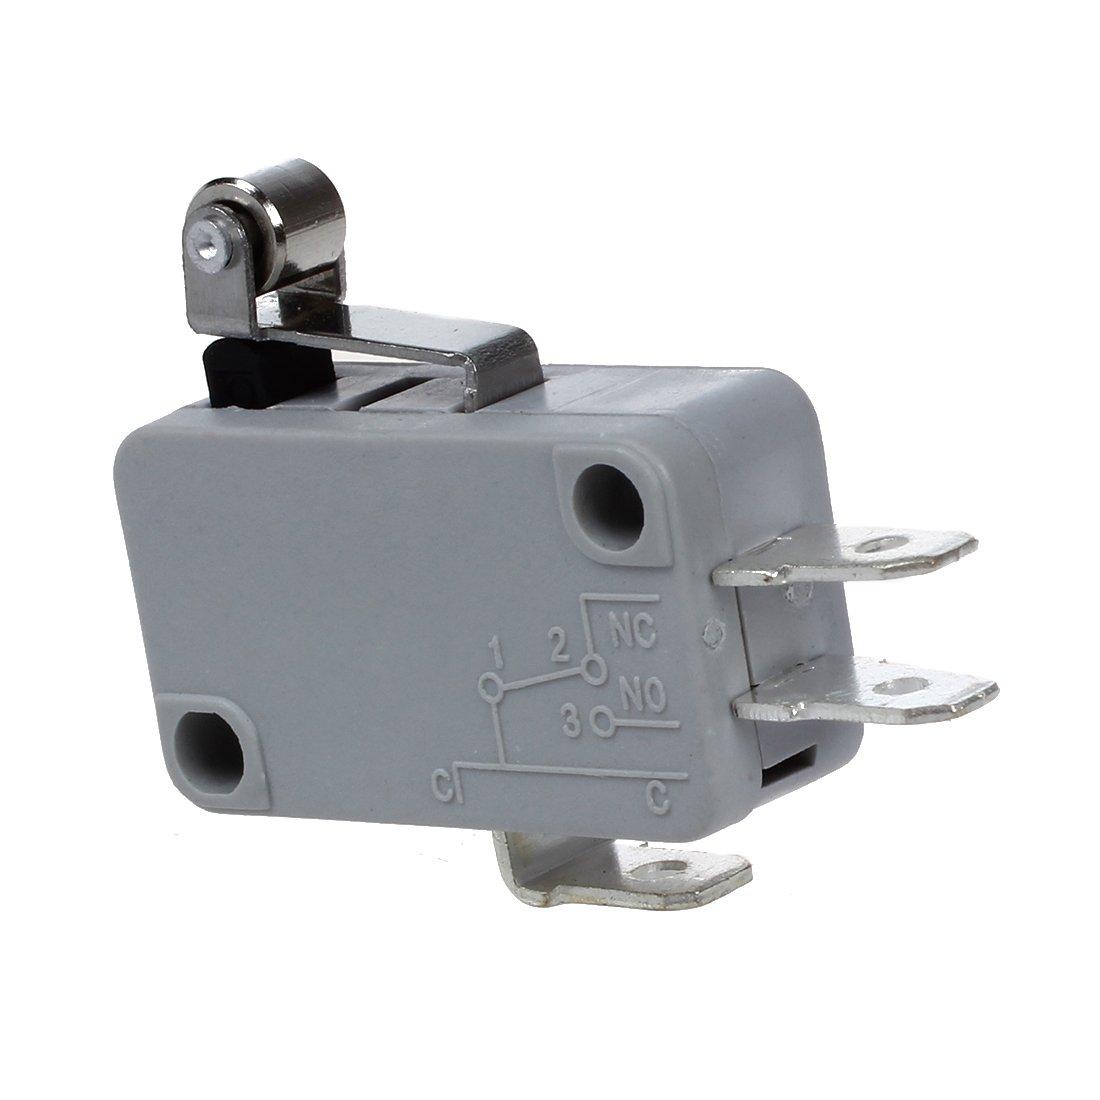 R SODIAL 2 x Micro Interruptor Rodillo Palanca Corta de Metal